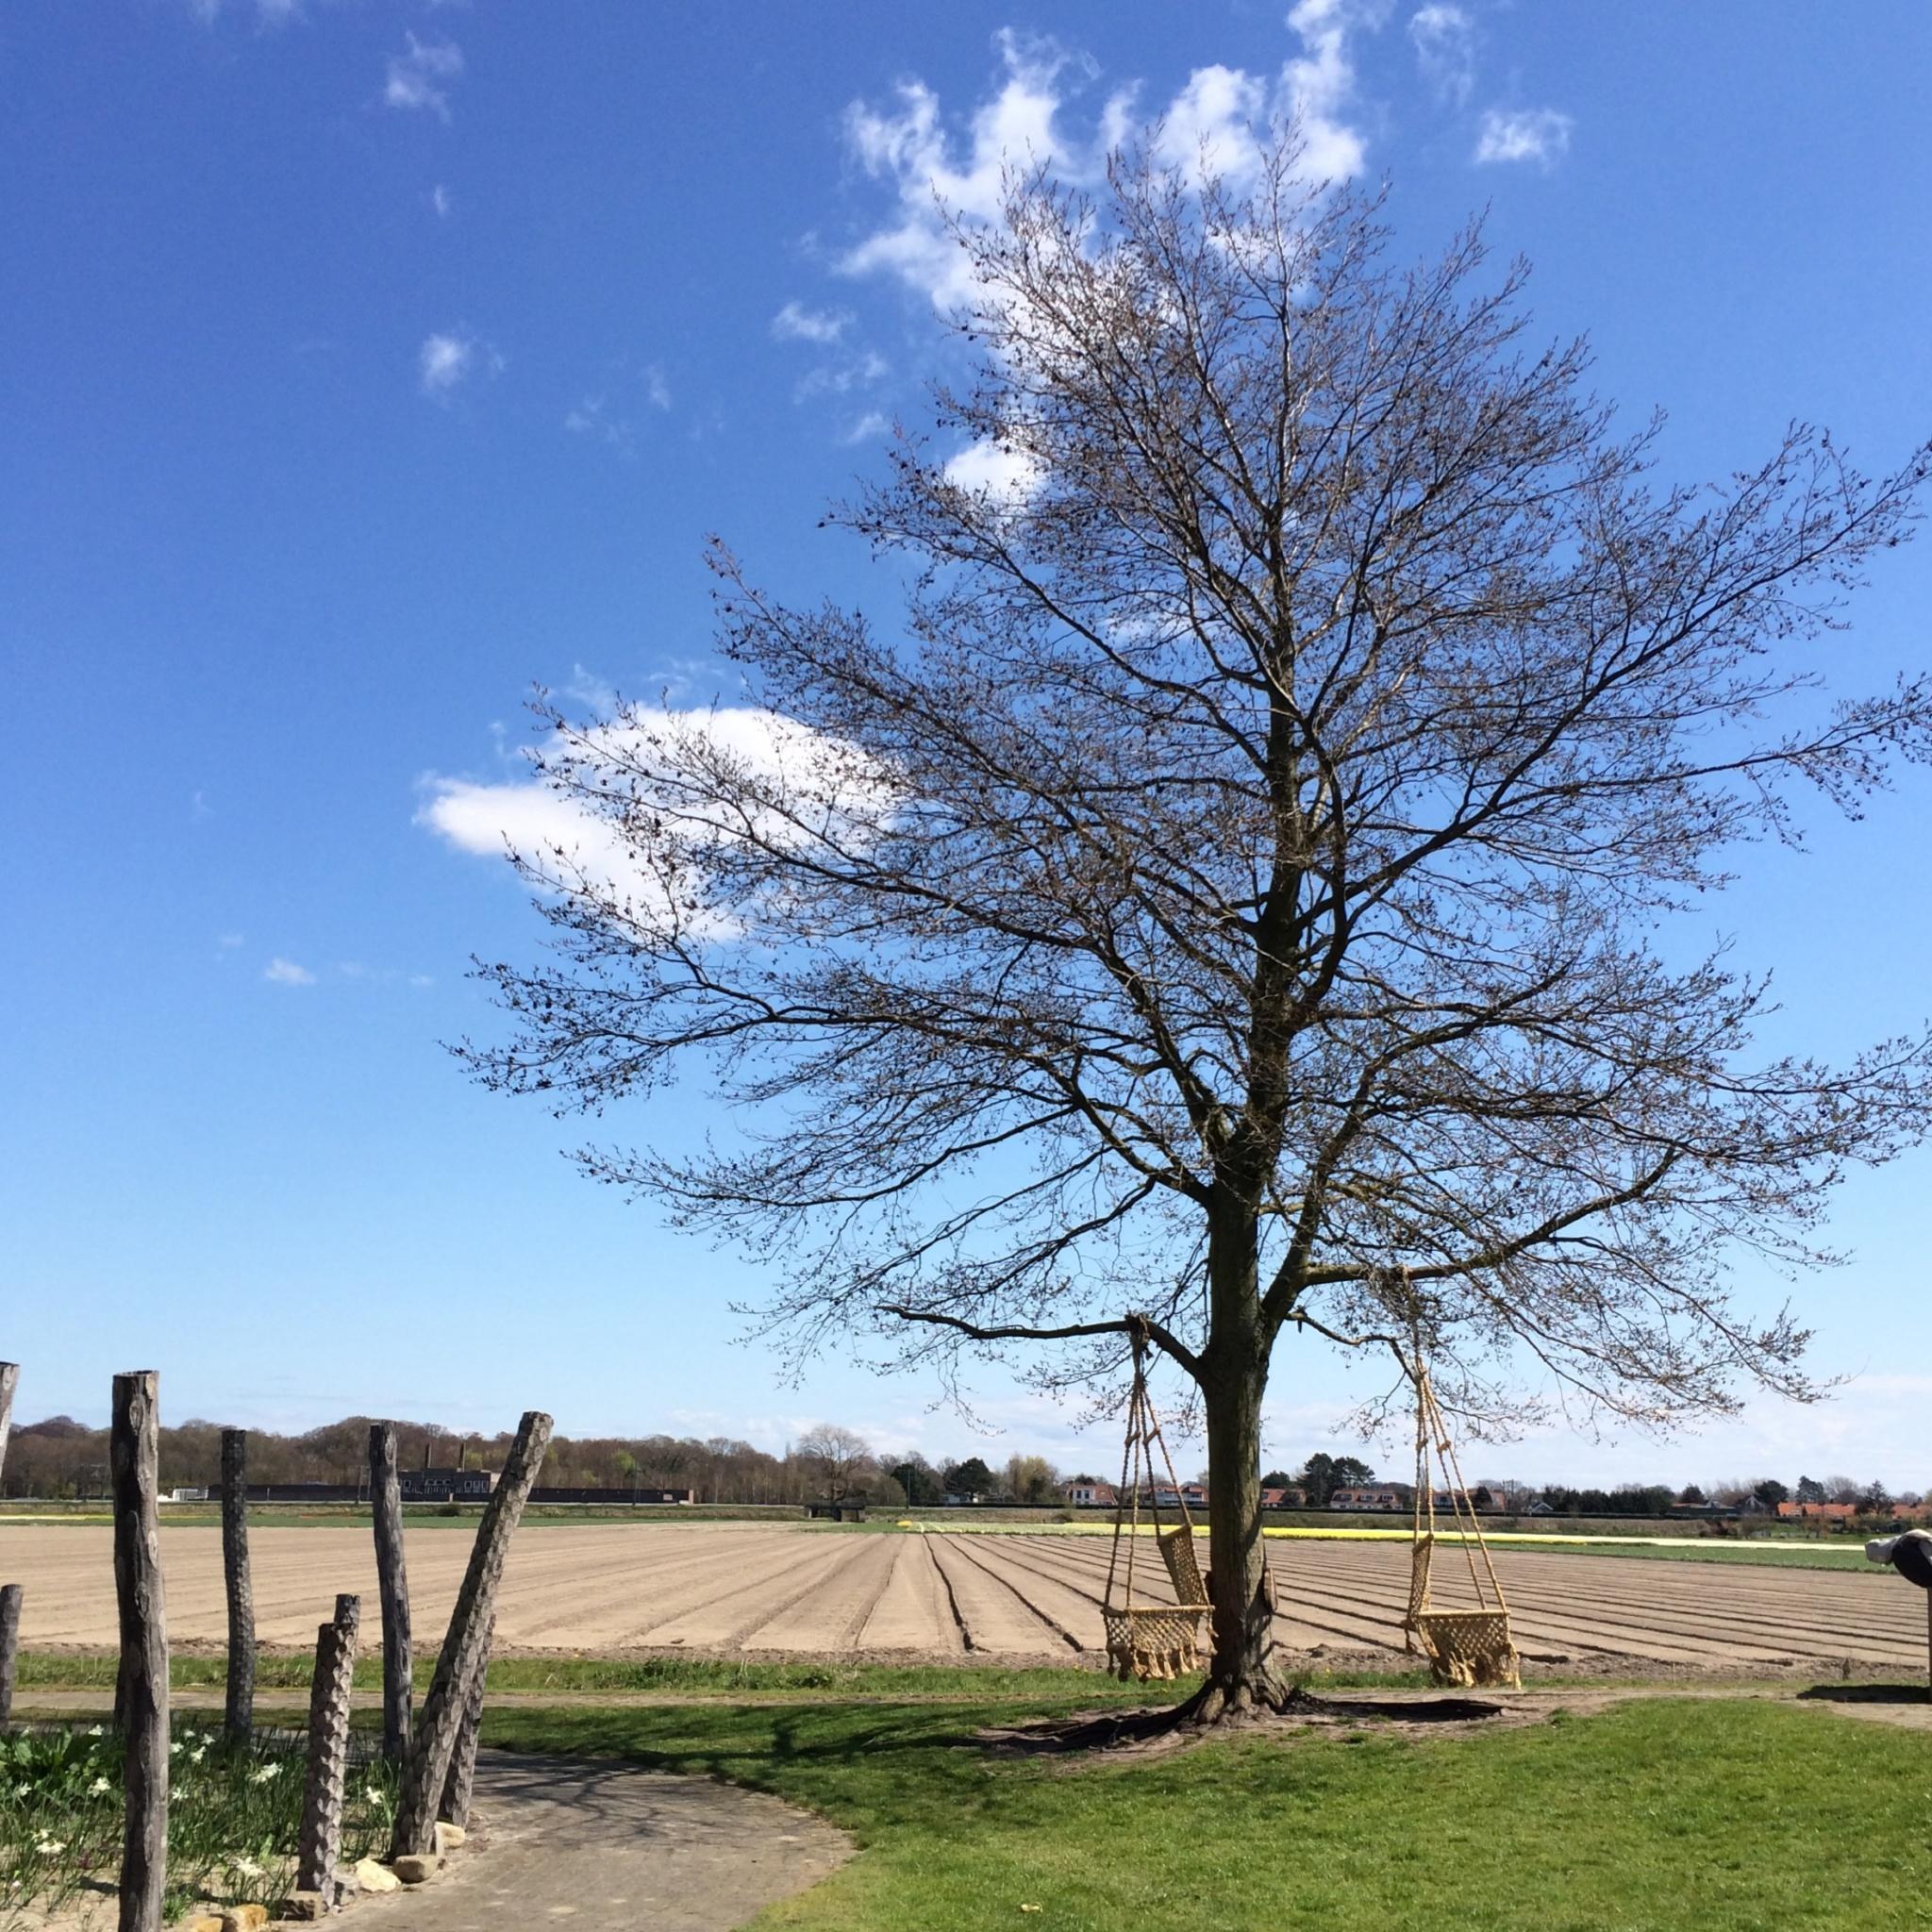 IMG 8525 - Buitenplaats Plantage in Vogelenzang